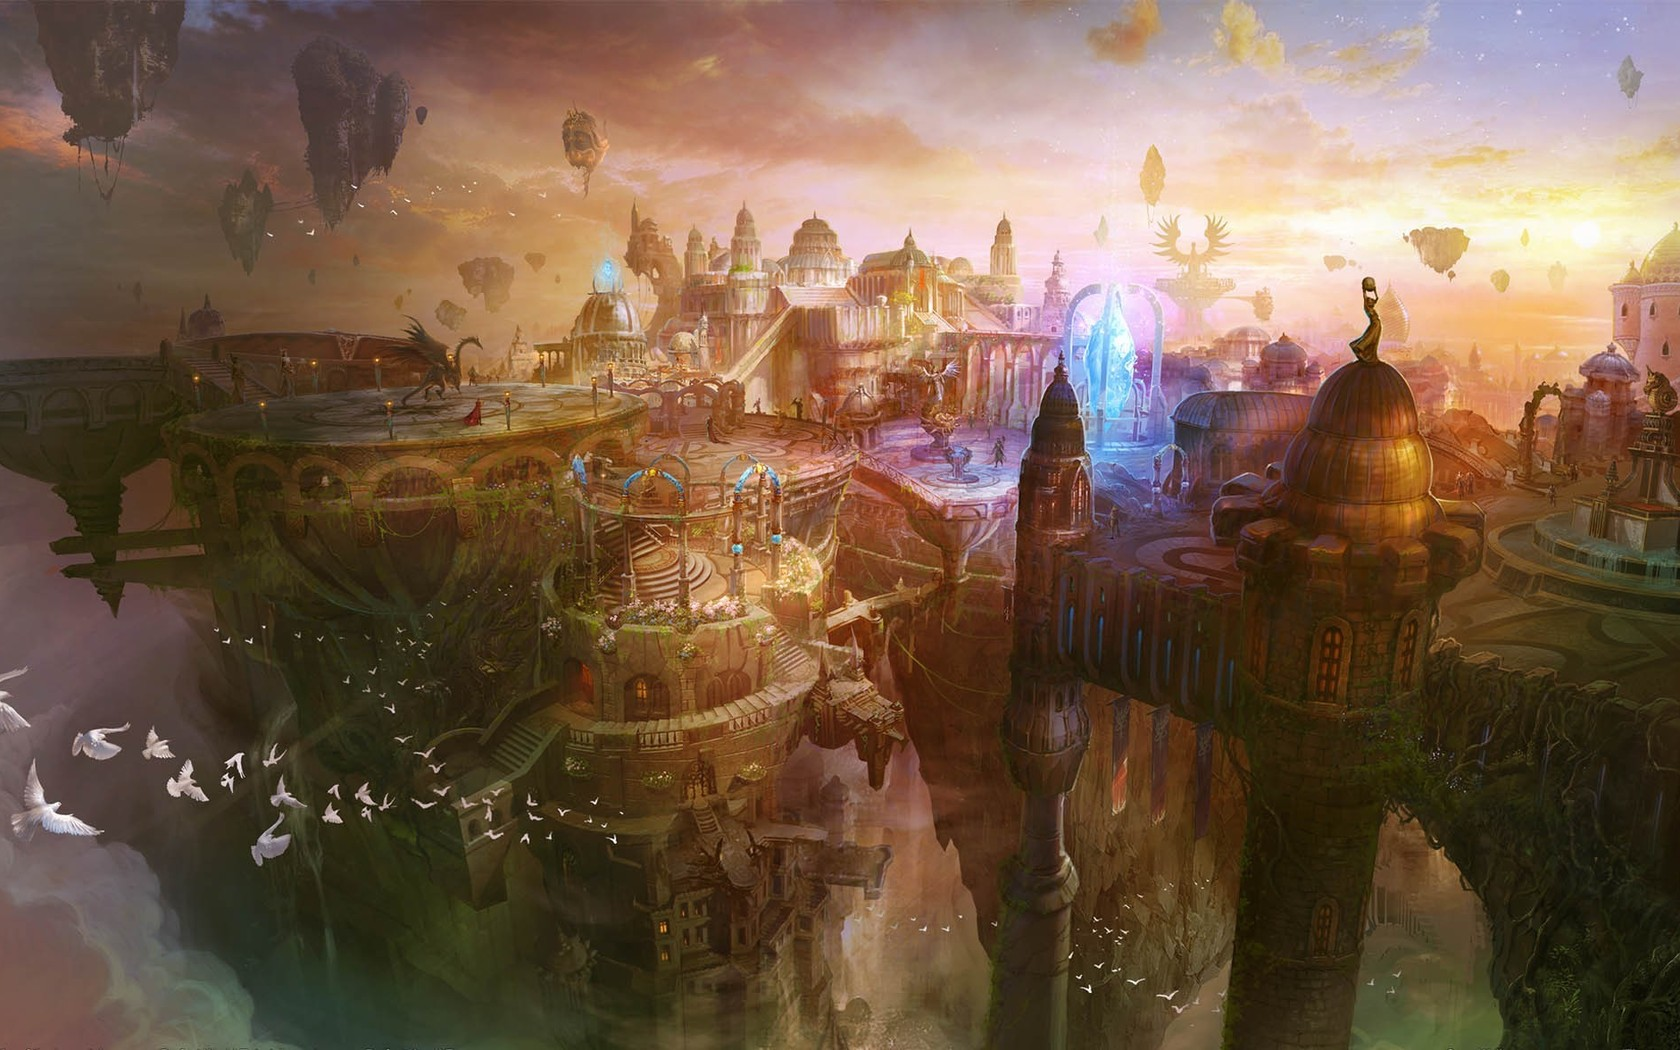 Ancient fantasy kingdom